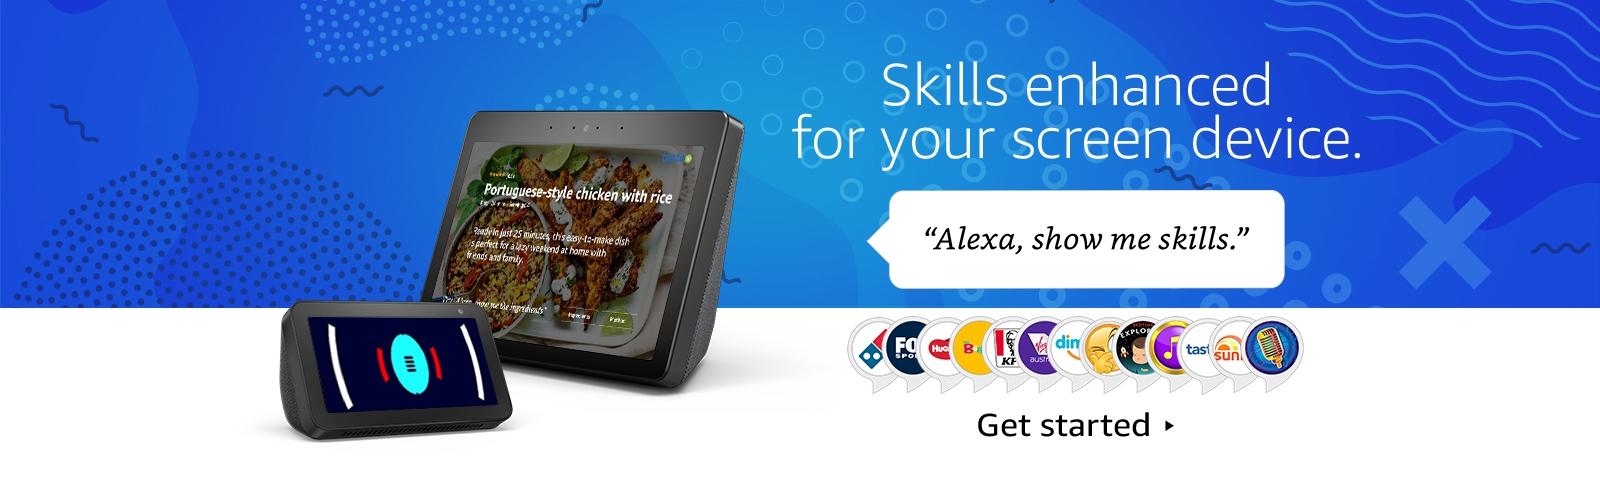 Alexa, show me skills